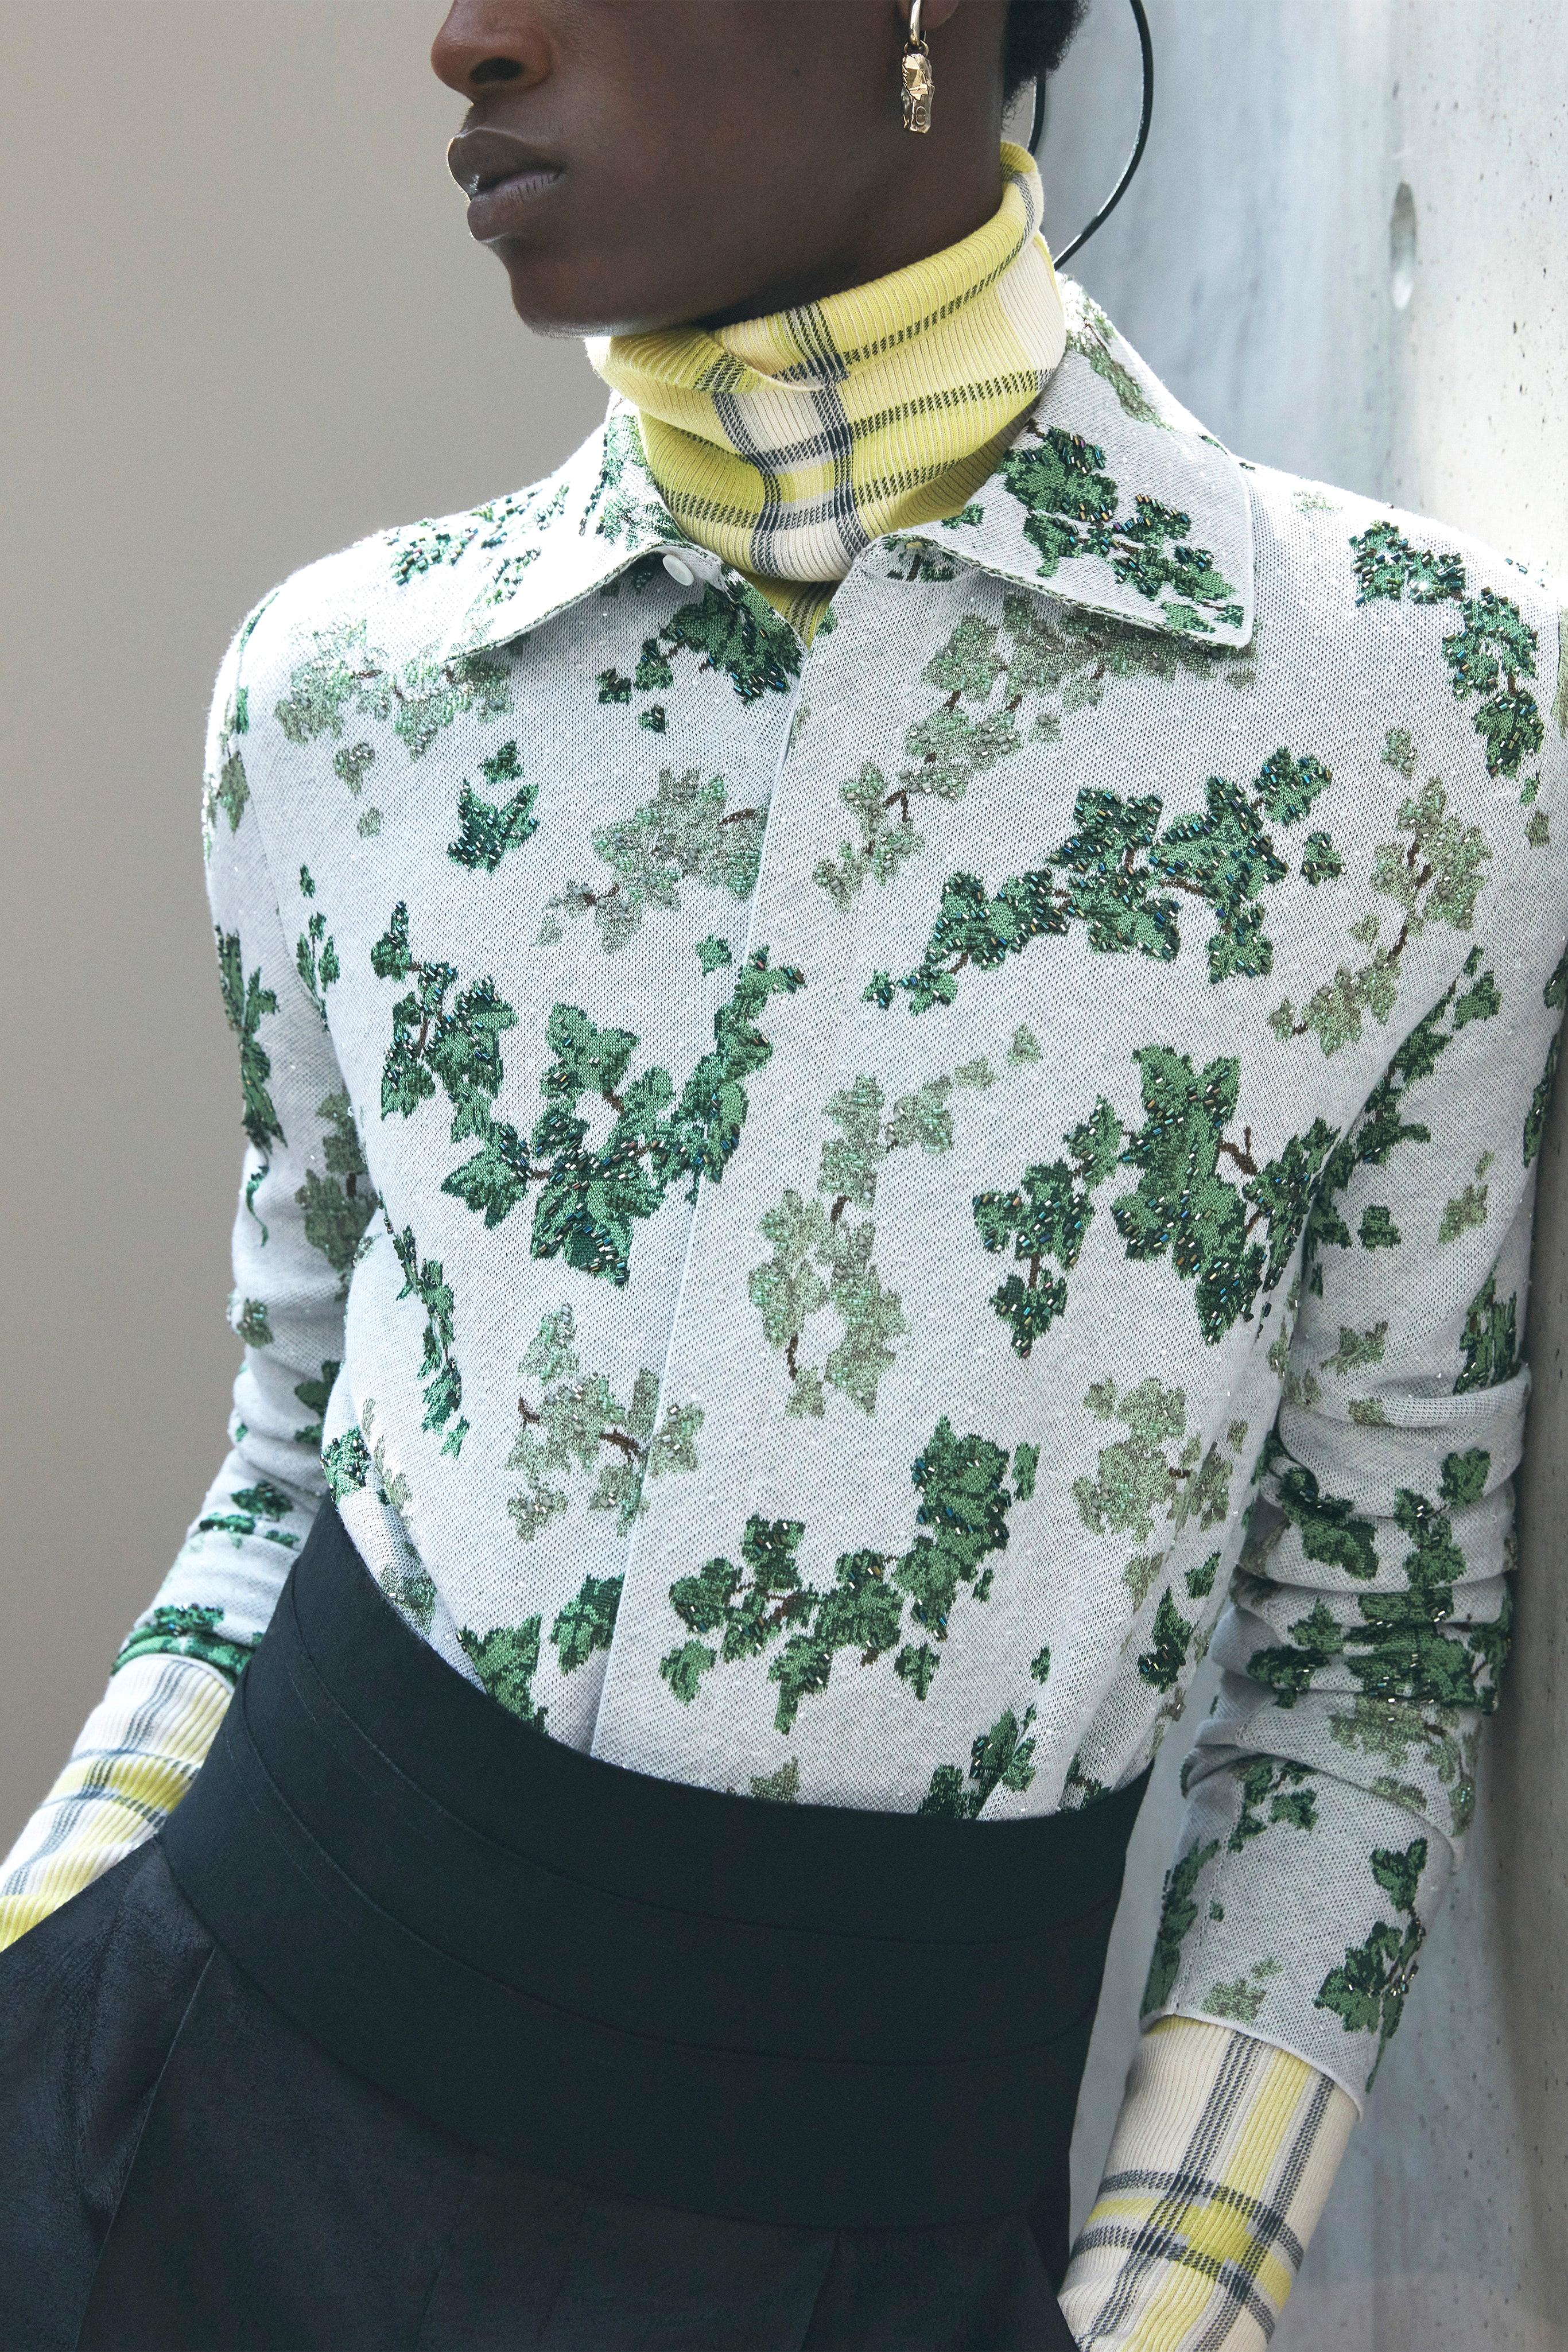 Dior Spring/Summer 2021 Menswear